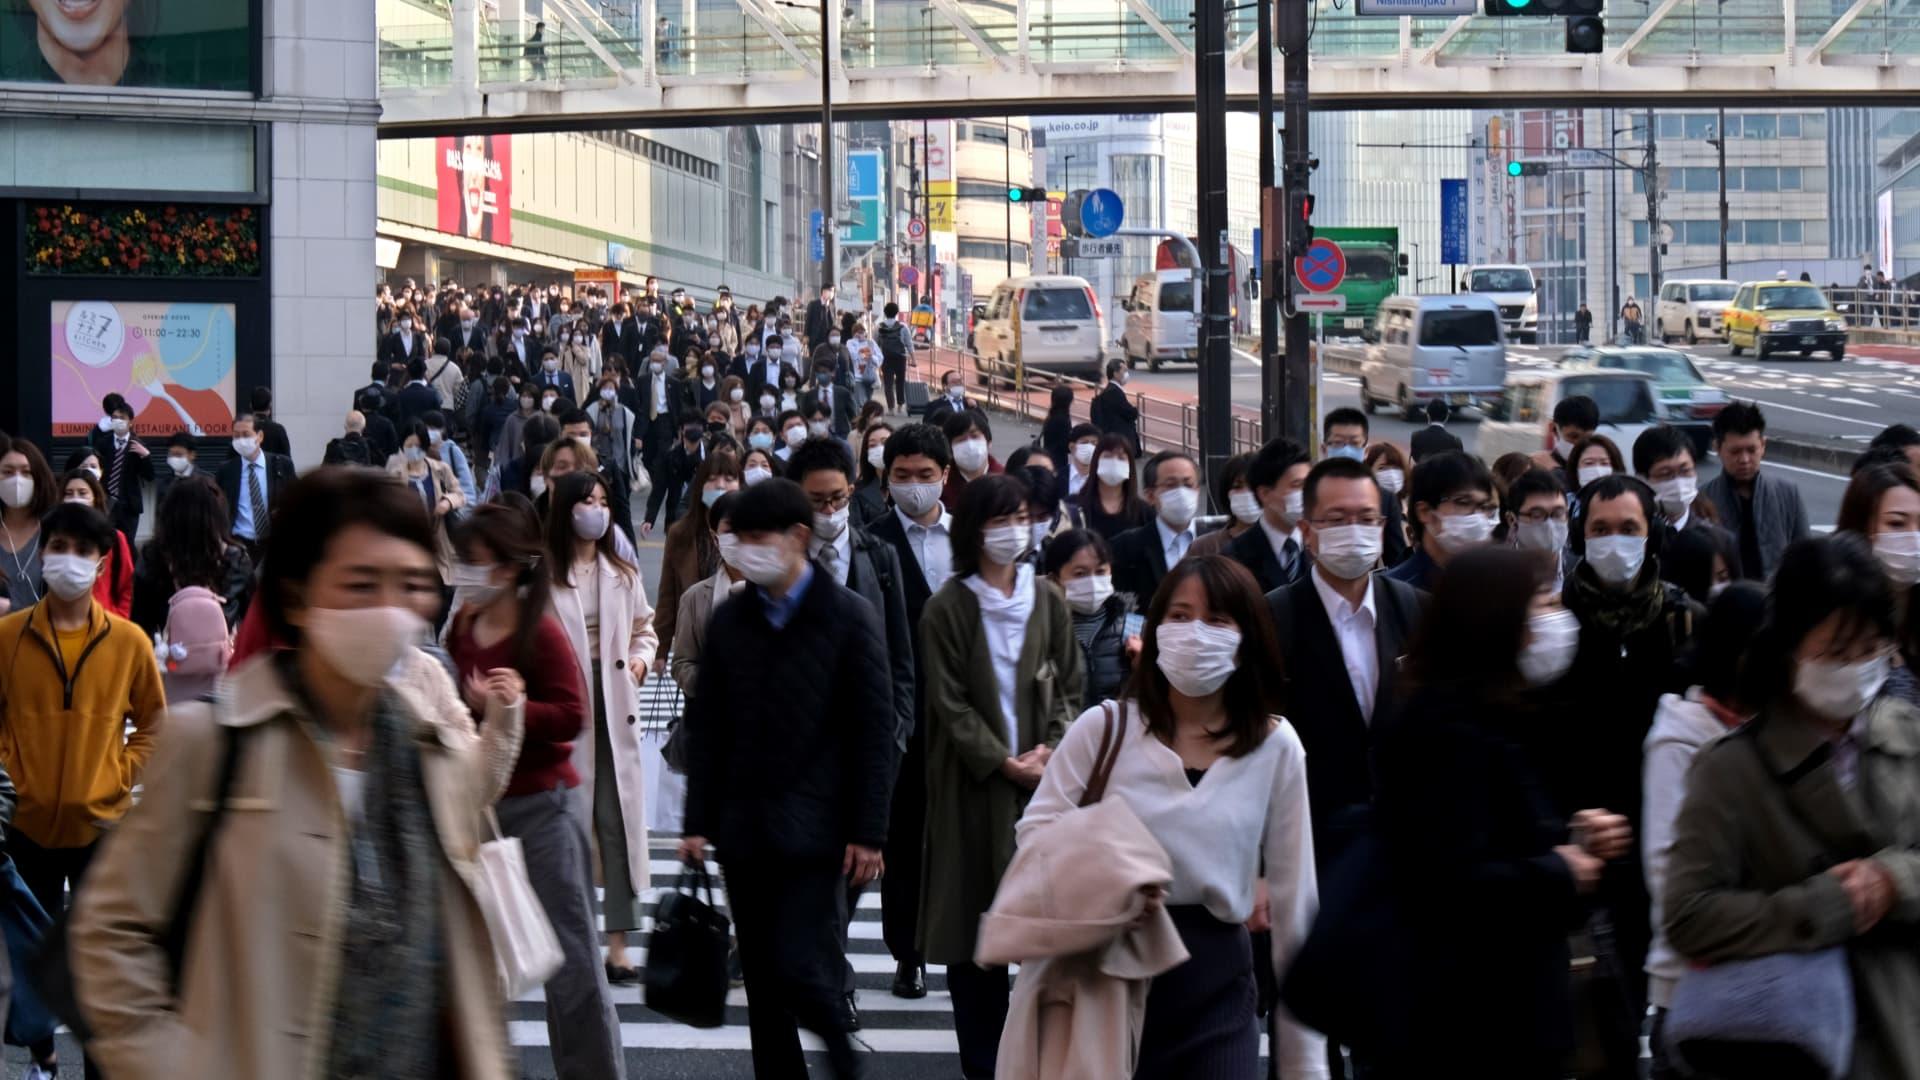 Commuters wearing masks walk near Shinjuku Station in Tokyo on November 19, 2020.